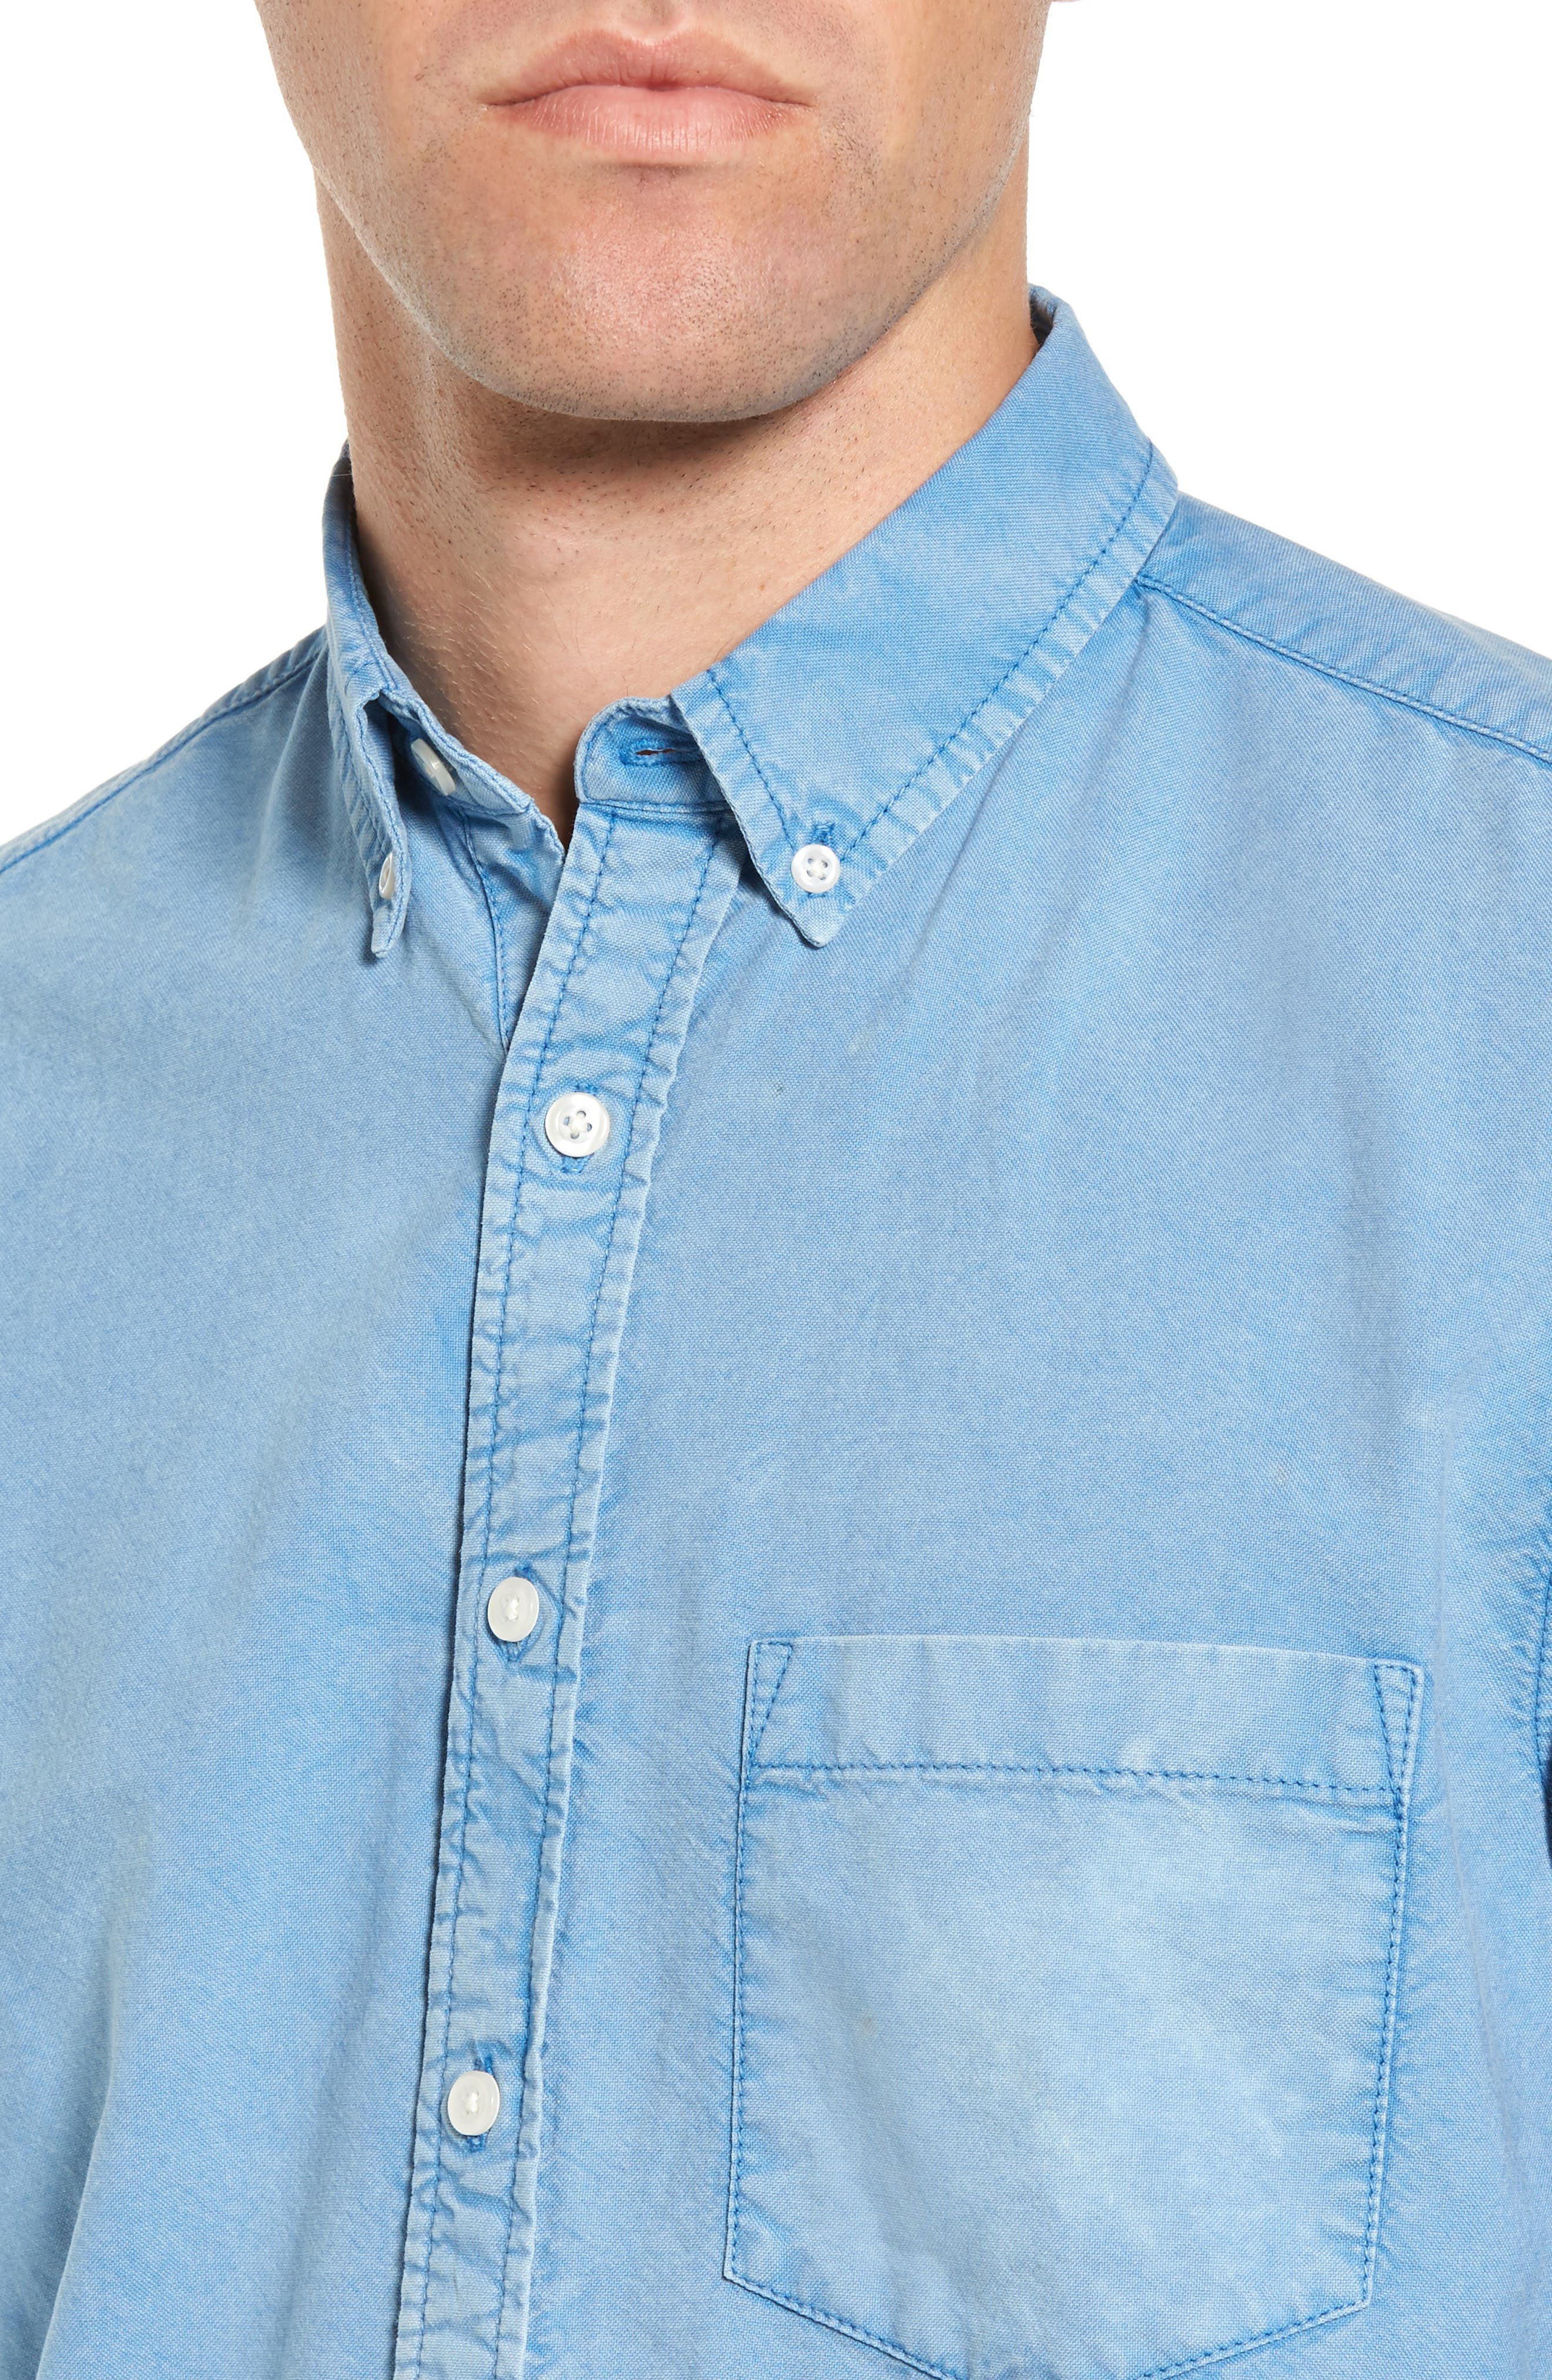 Regular Fit Oxford Sport Shirt,                             Alternate thumbnail 4, color,                             460